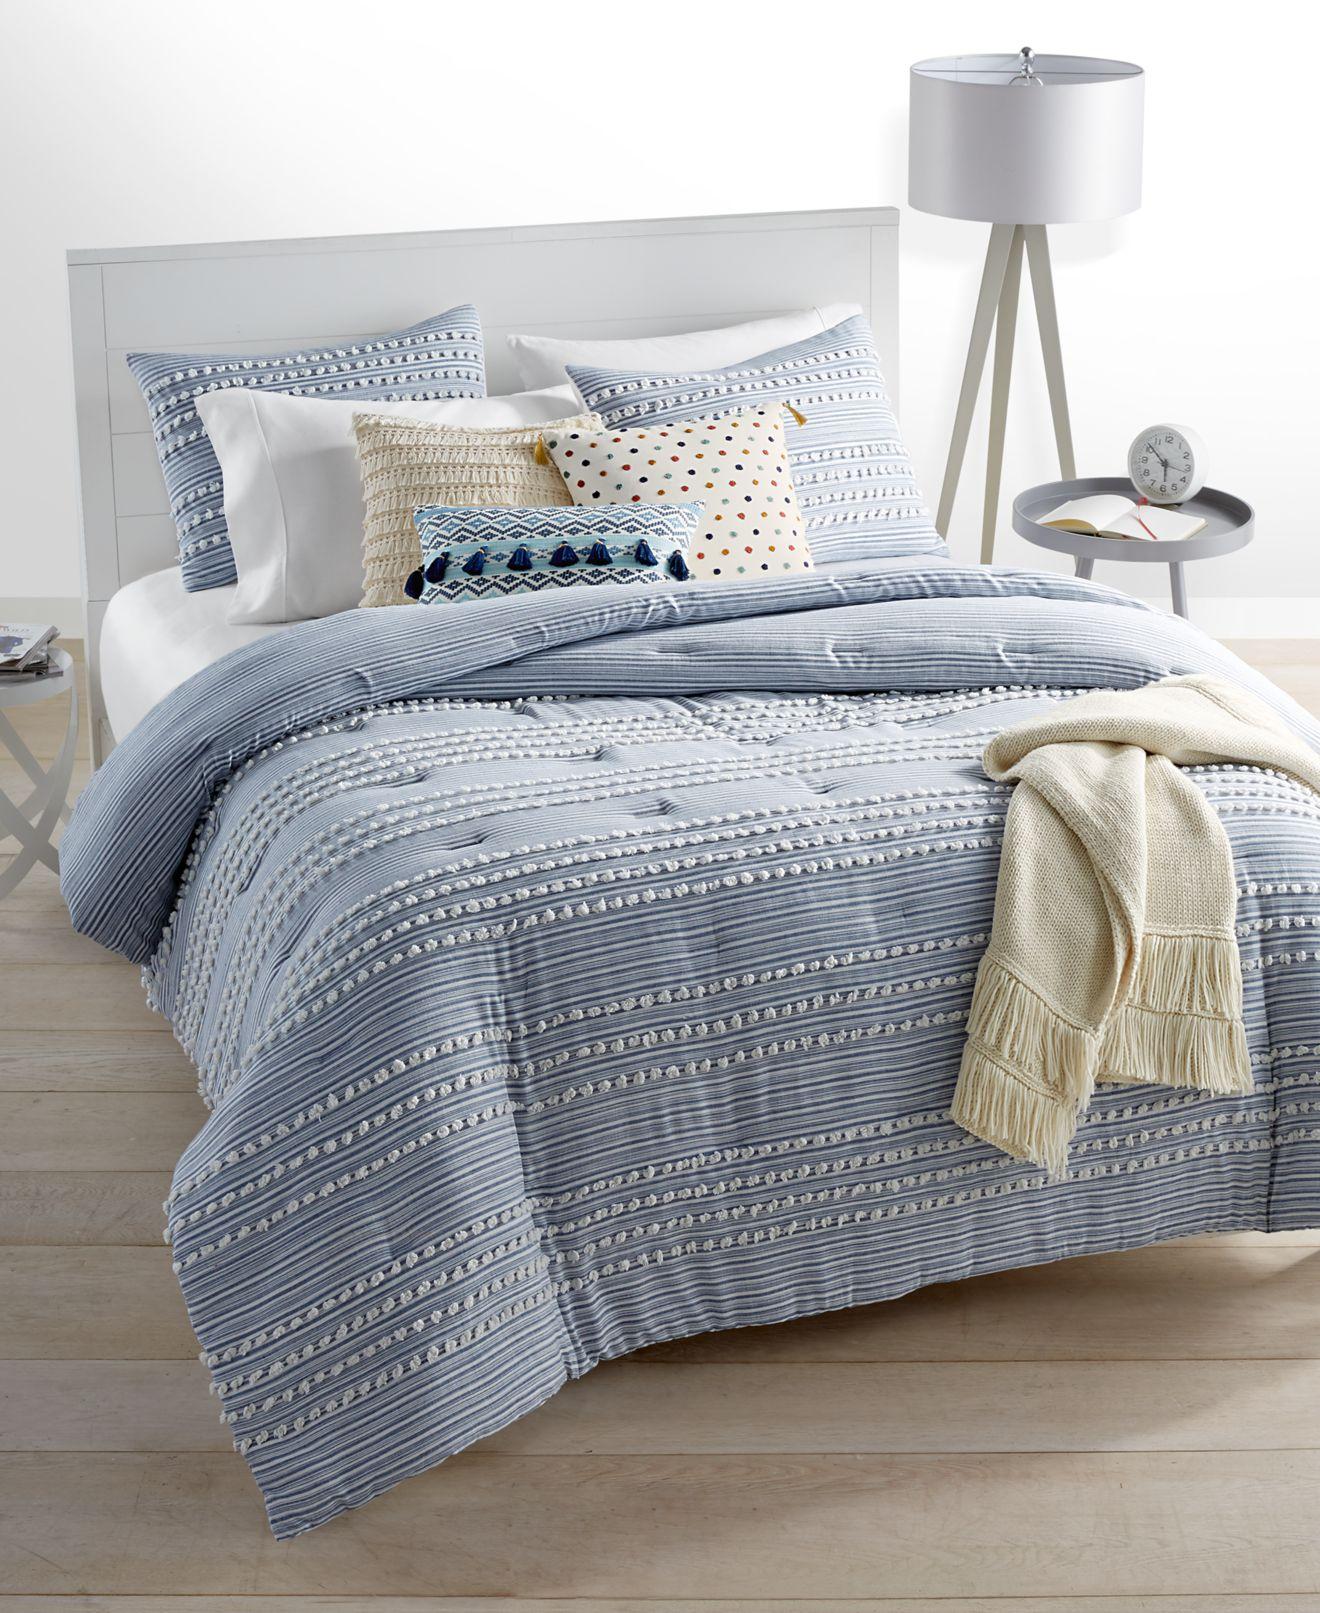 girls bedding sets - macy's